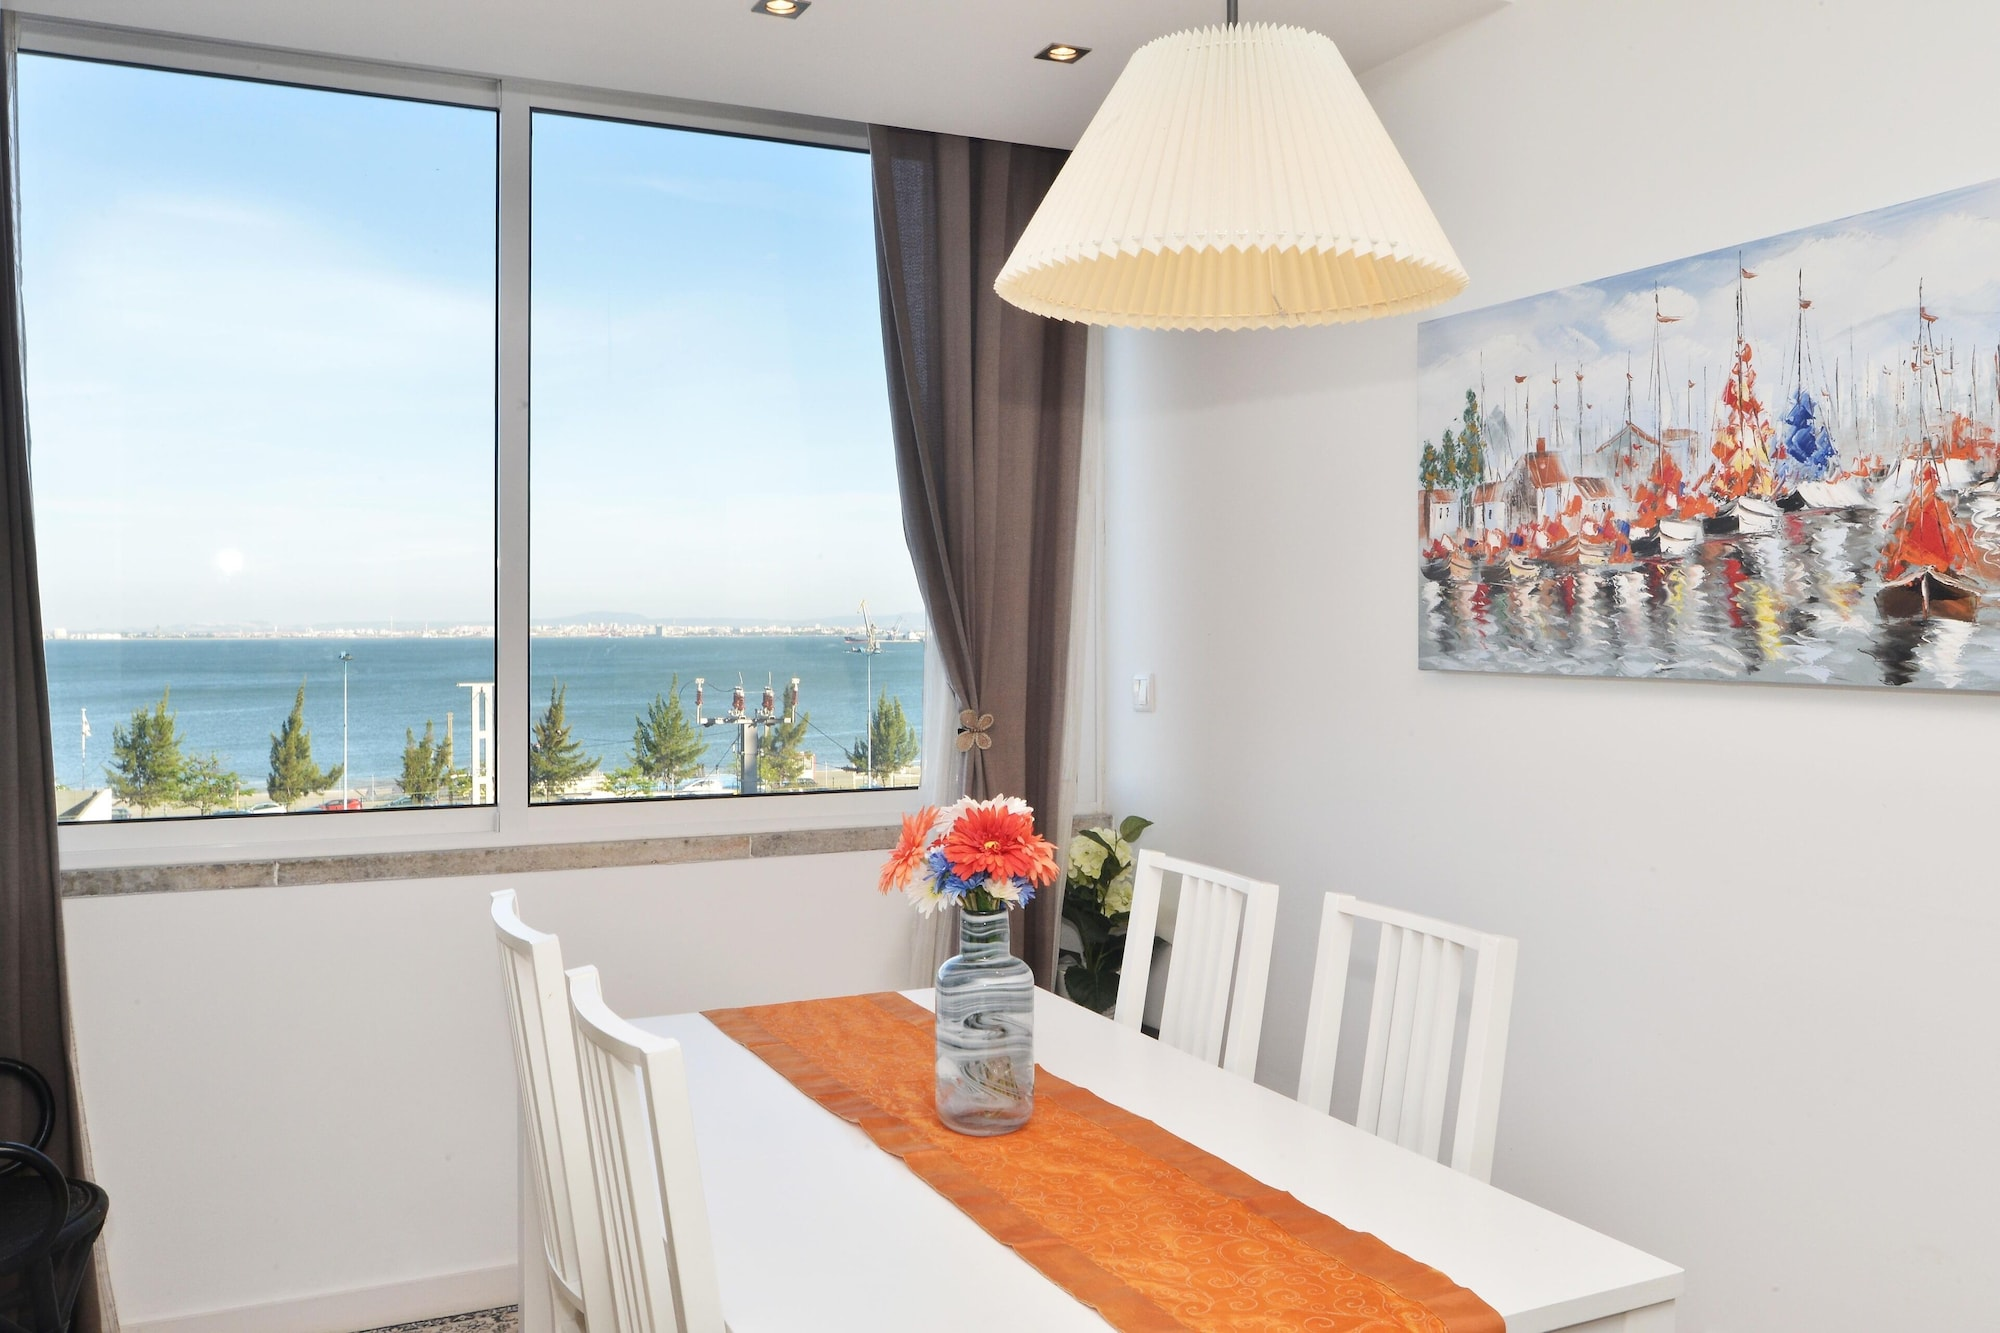 Tejo Blue & Bright Apartment, Lisboa